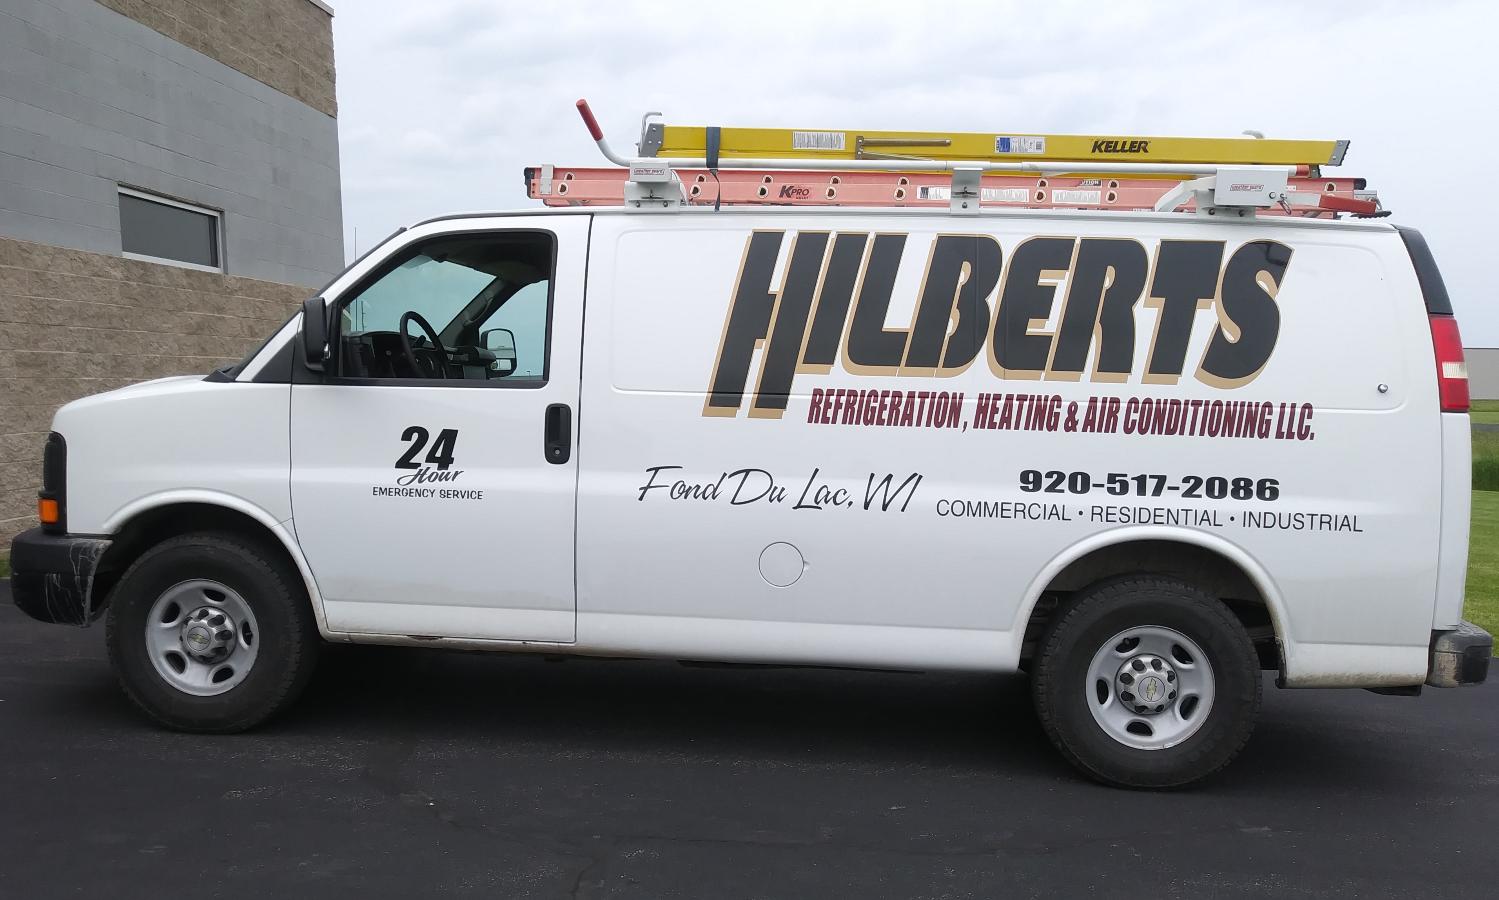 Hilberts